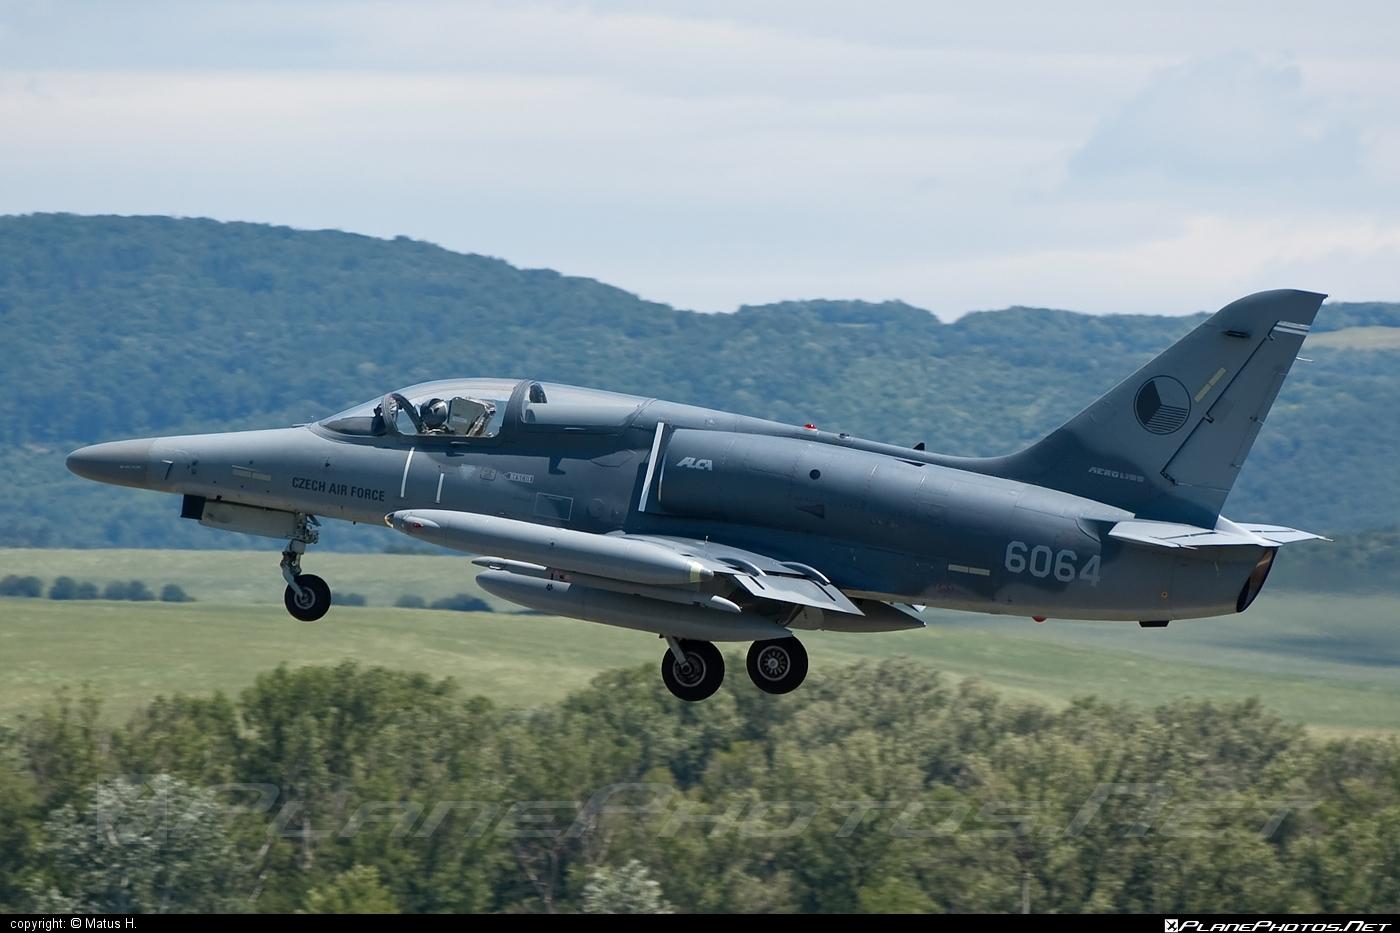 Aero L-159A Alca - 6064 operated by Vzdušné síly AČR (Czech Air Force) #aero #aerol159 #aerol159aalca #aerol159alca #czechairforce #l159 #l159a #l159aalca #l159alca #vzdusnesilyacr